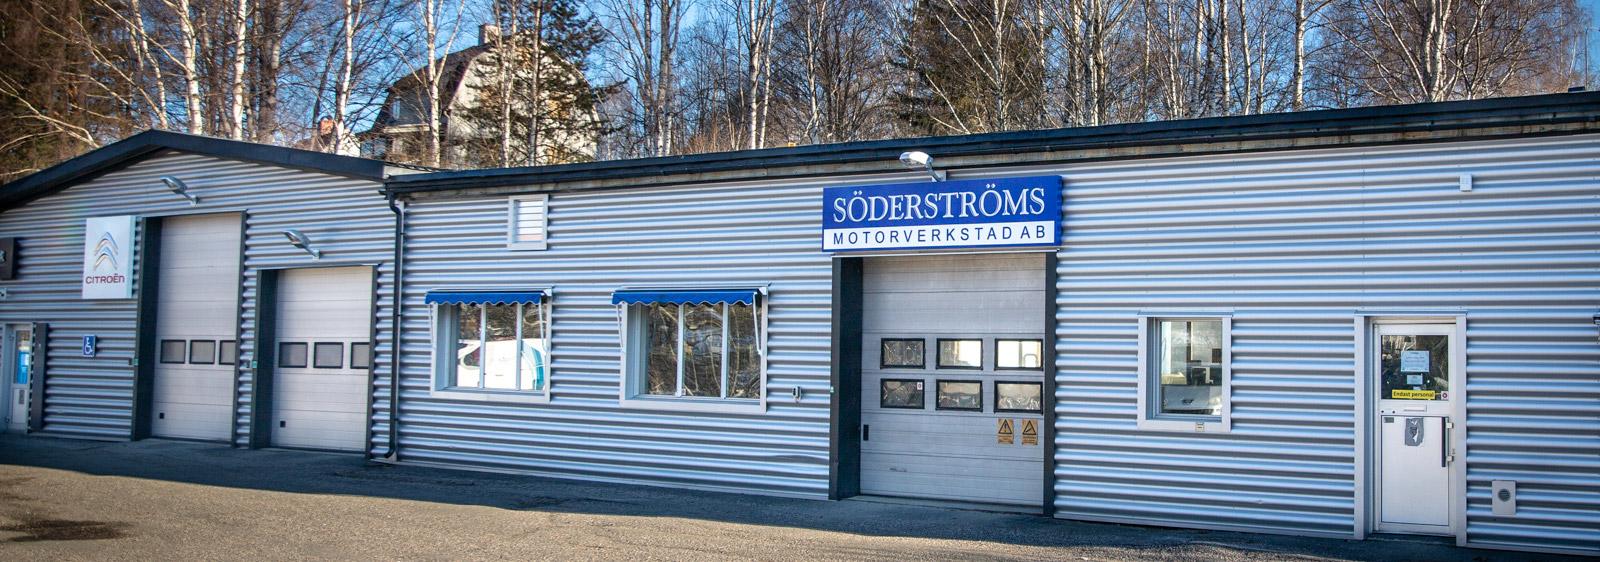 Bilverkstad Sundsvall